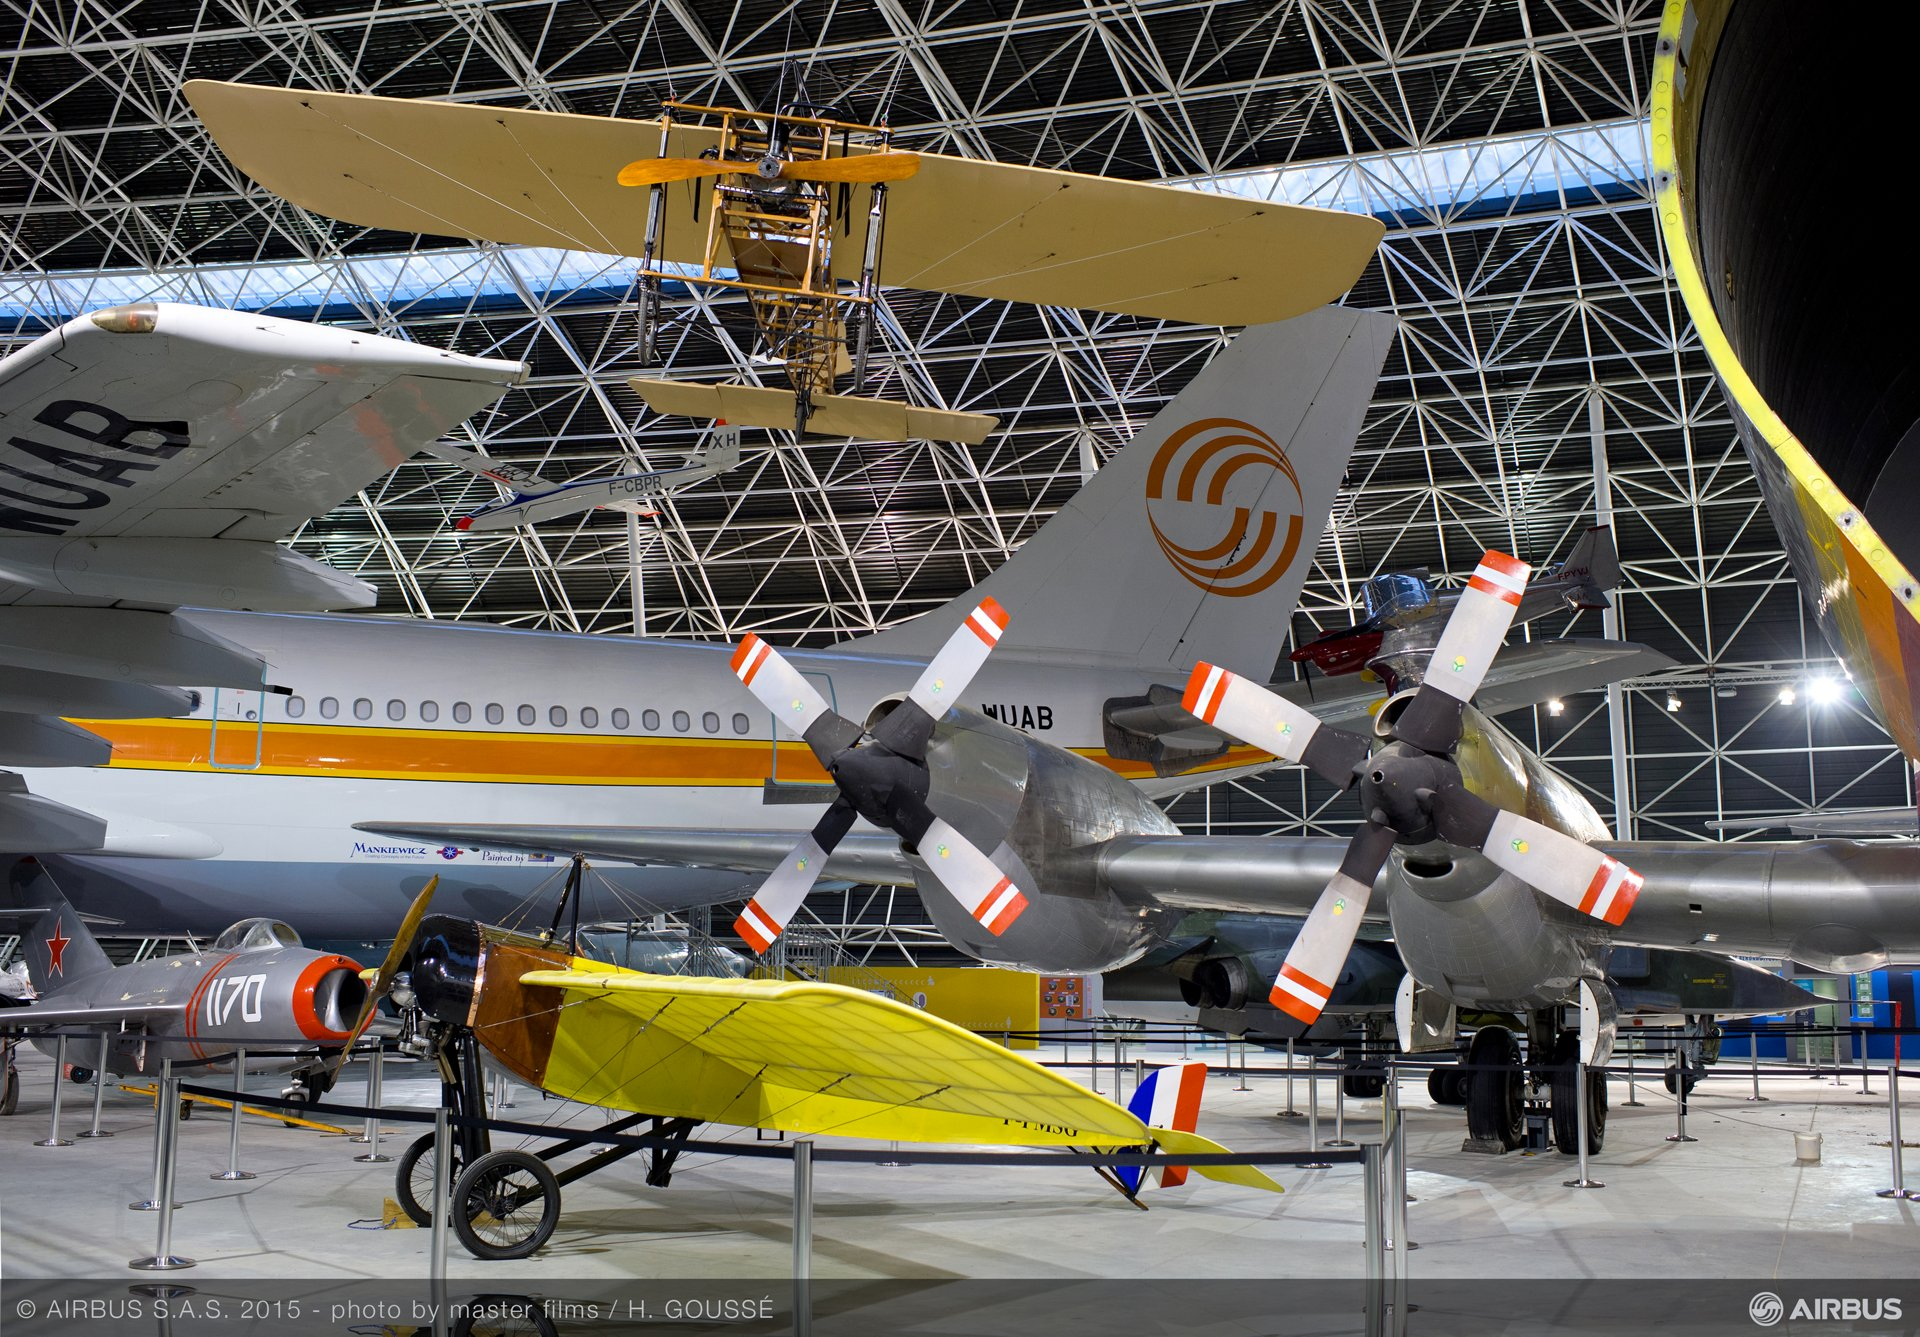 Aeroscopia museum aircraft display 4